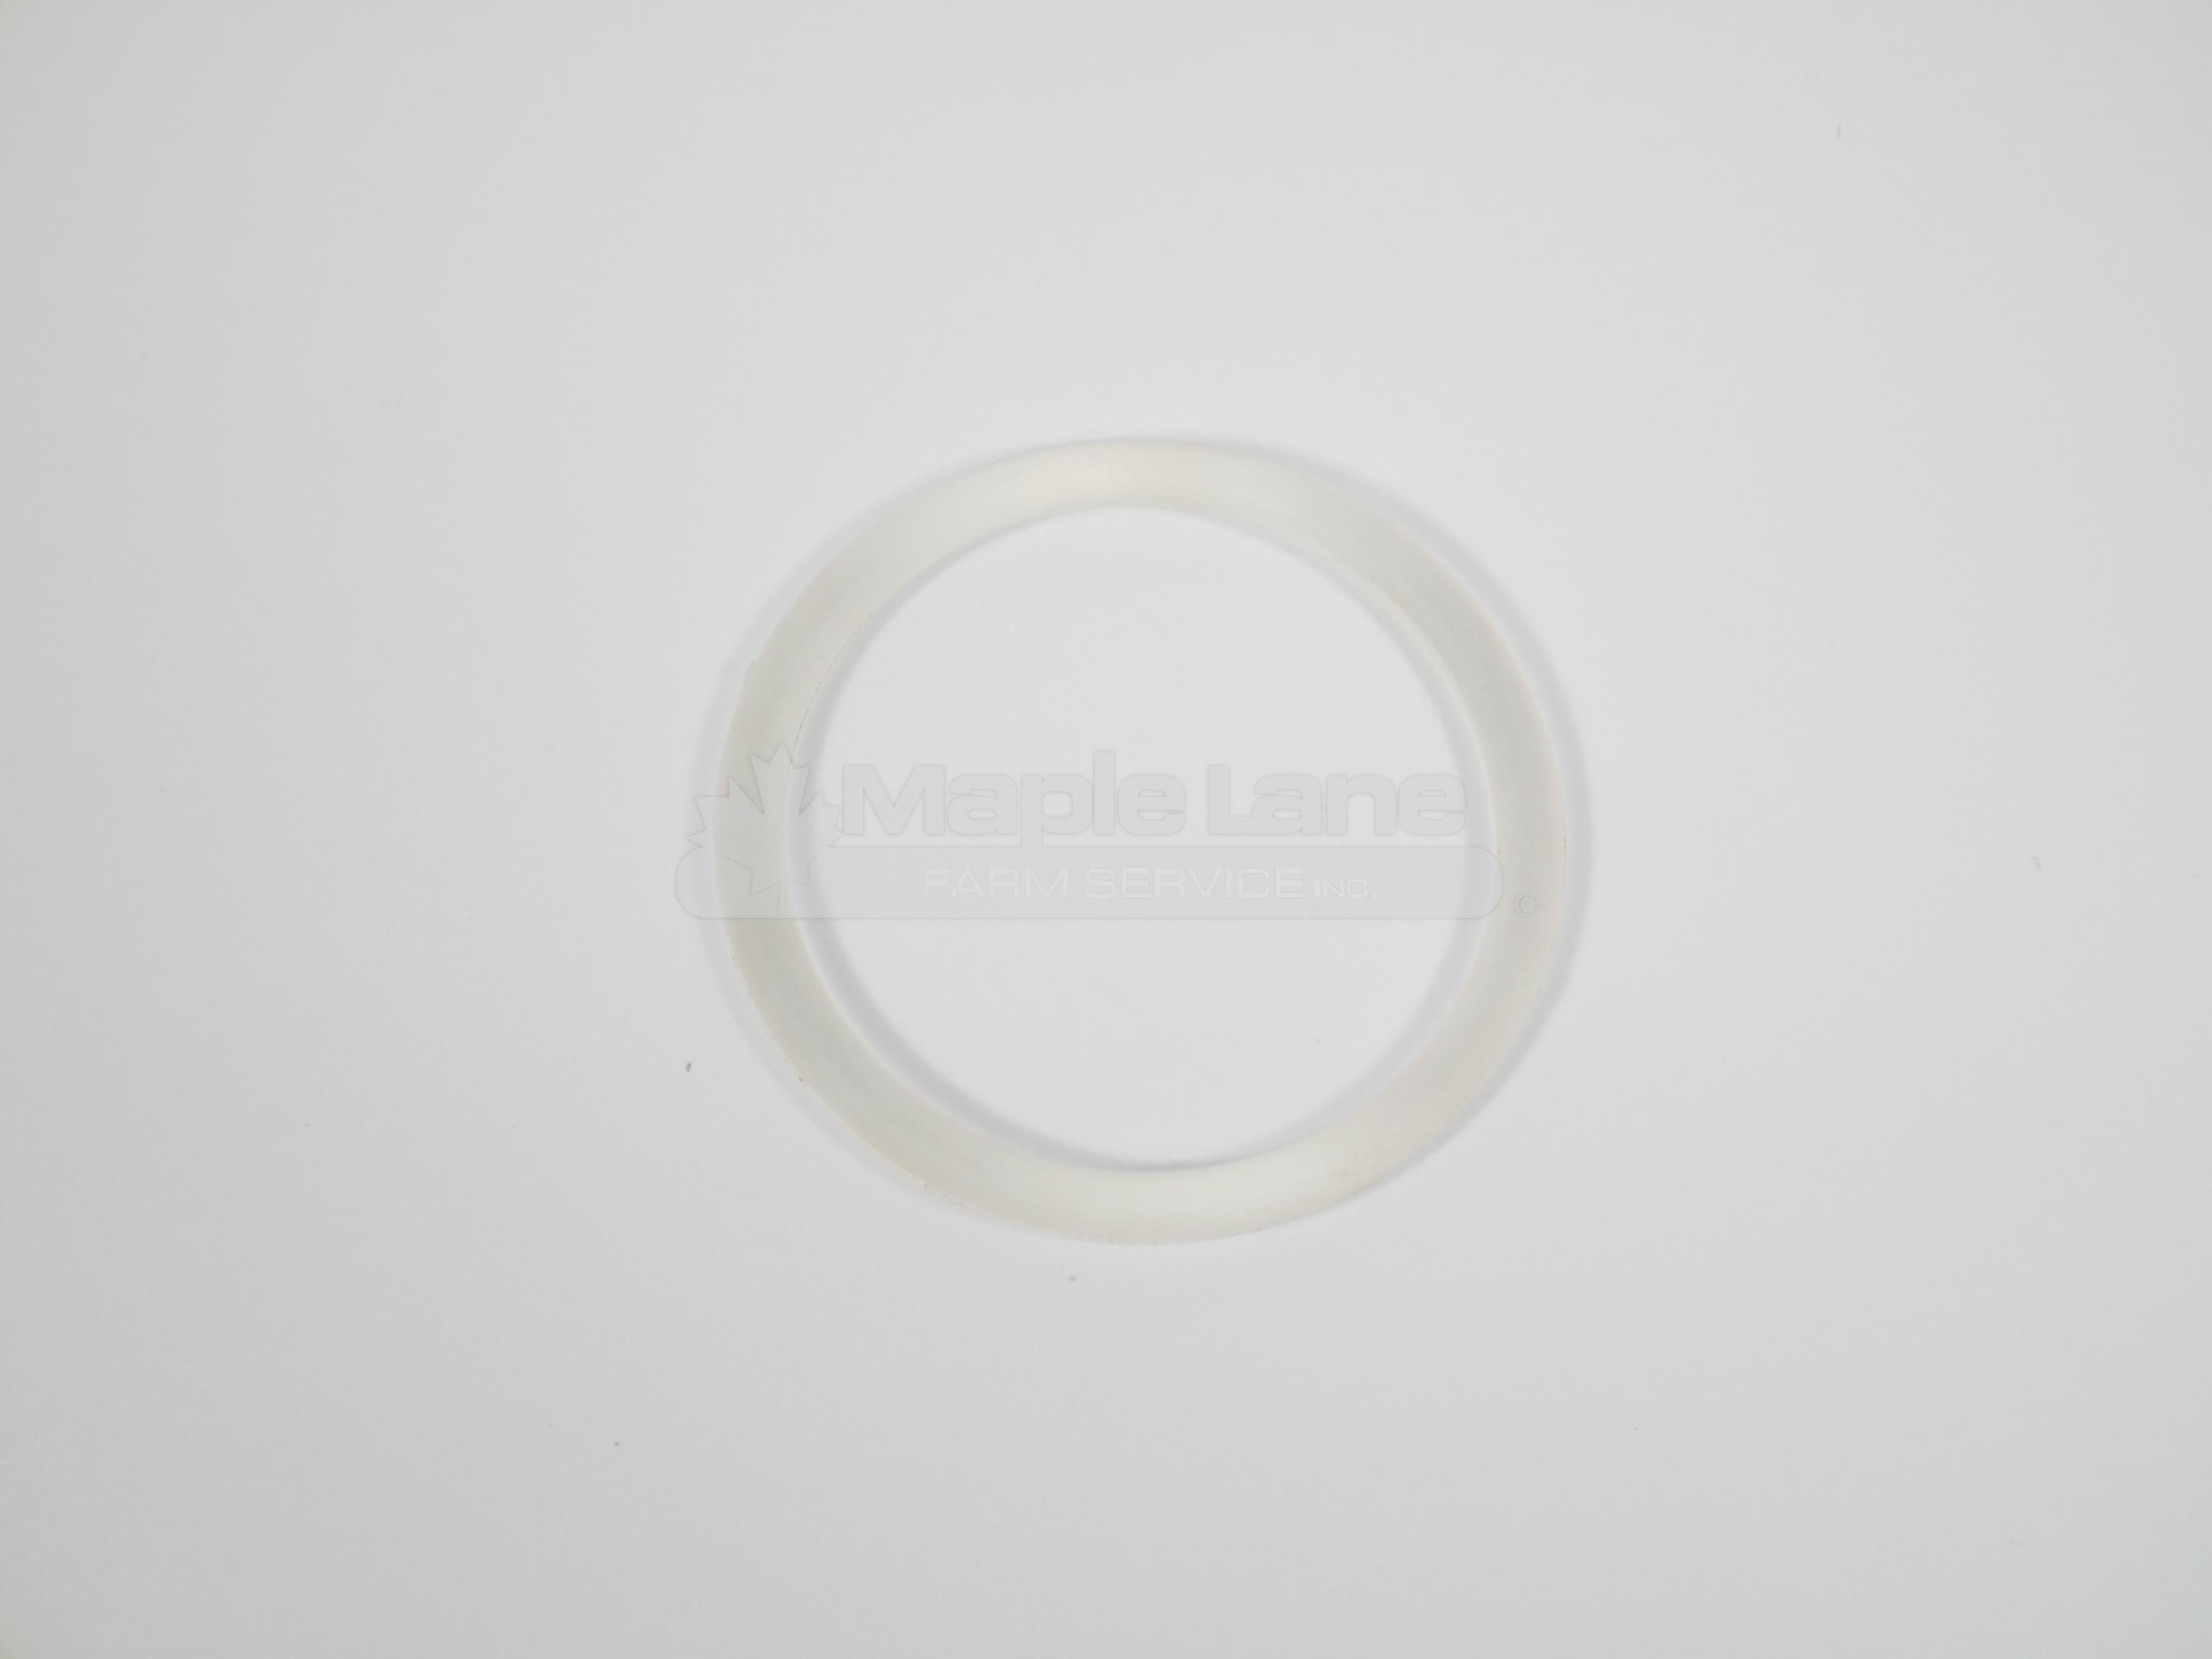 330024 O-Ring